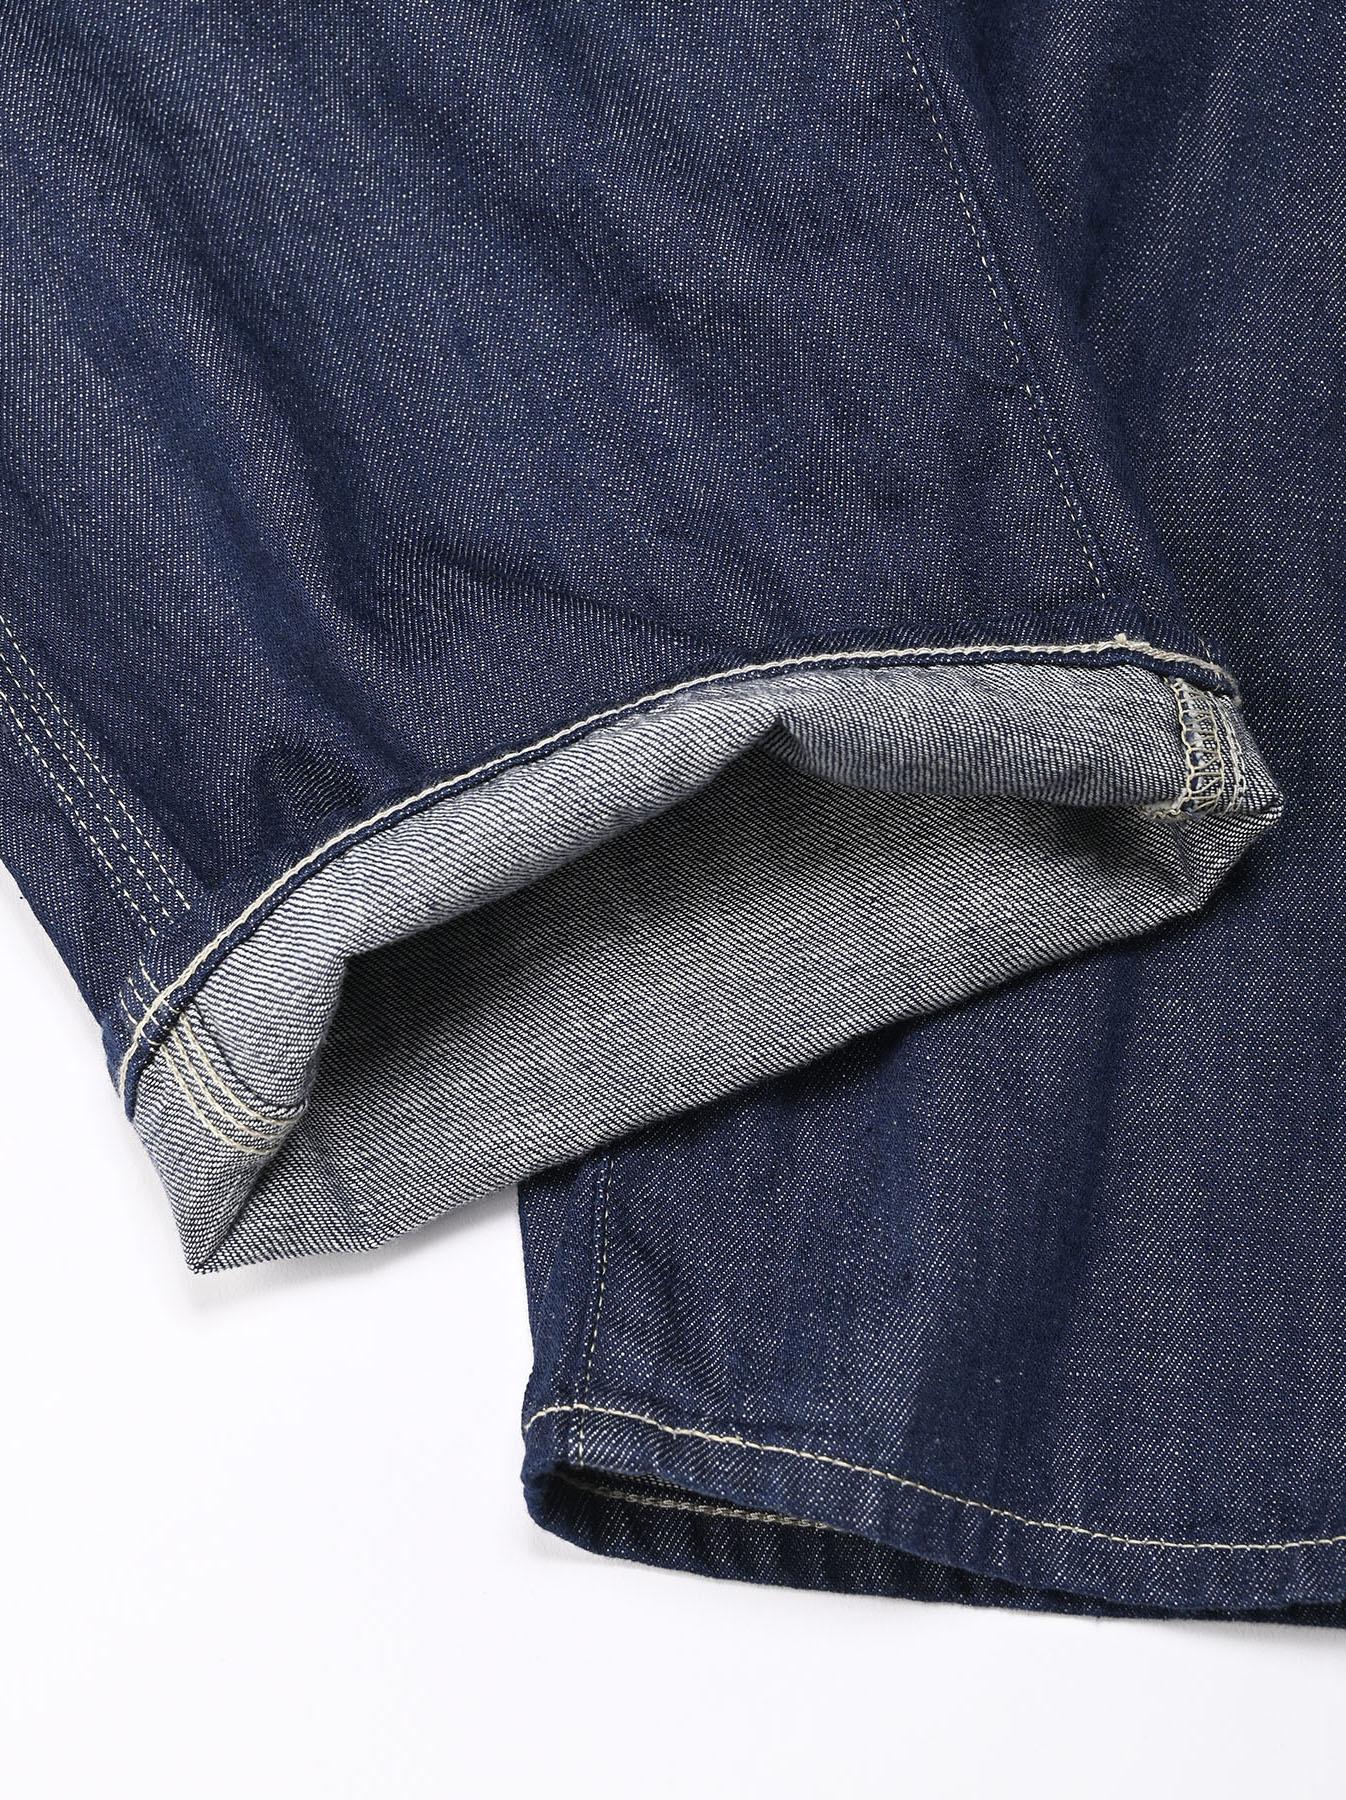 Indigo Nou 908 Painter Pants (0721)-11